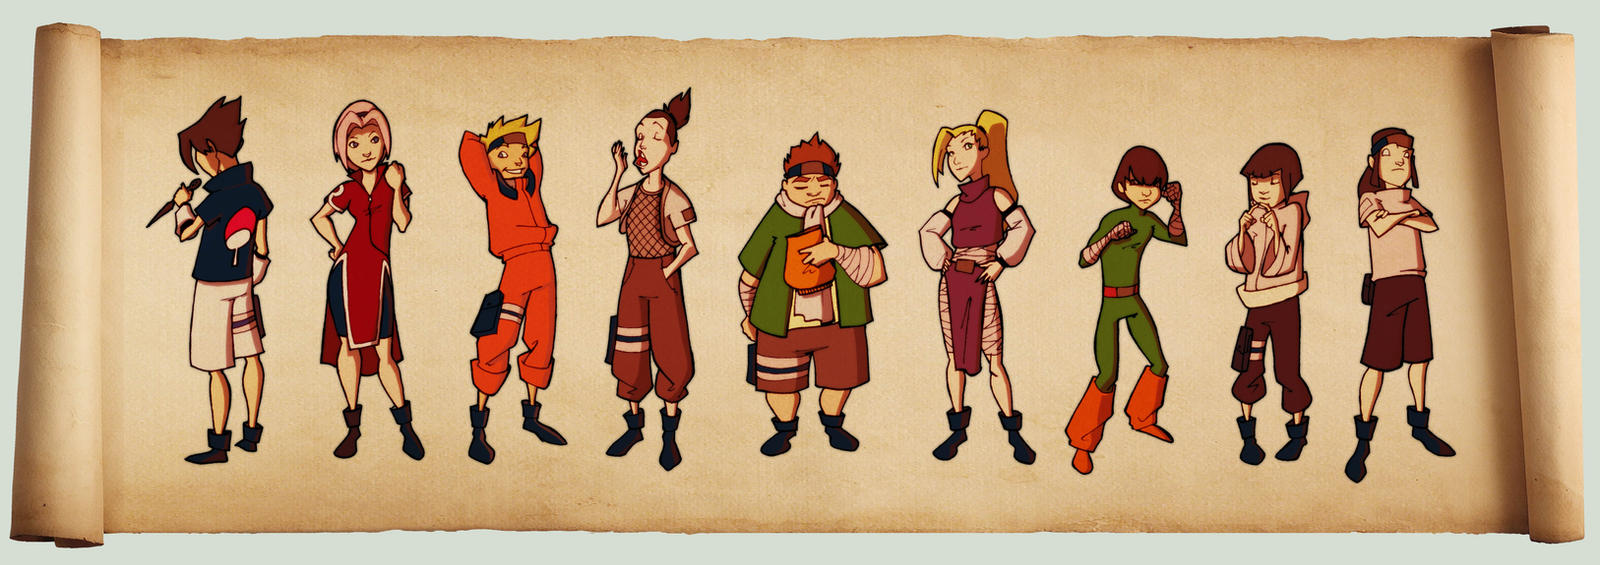 Naruto Lineup by AviKishundat